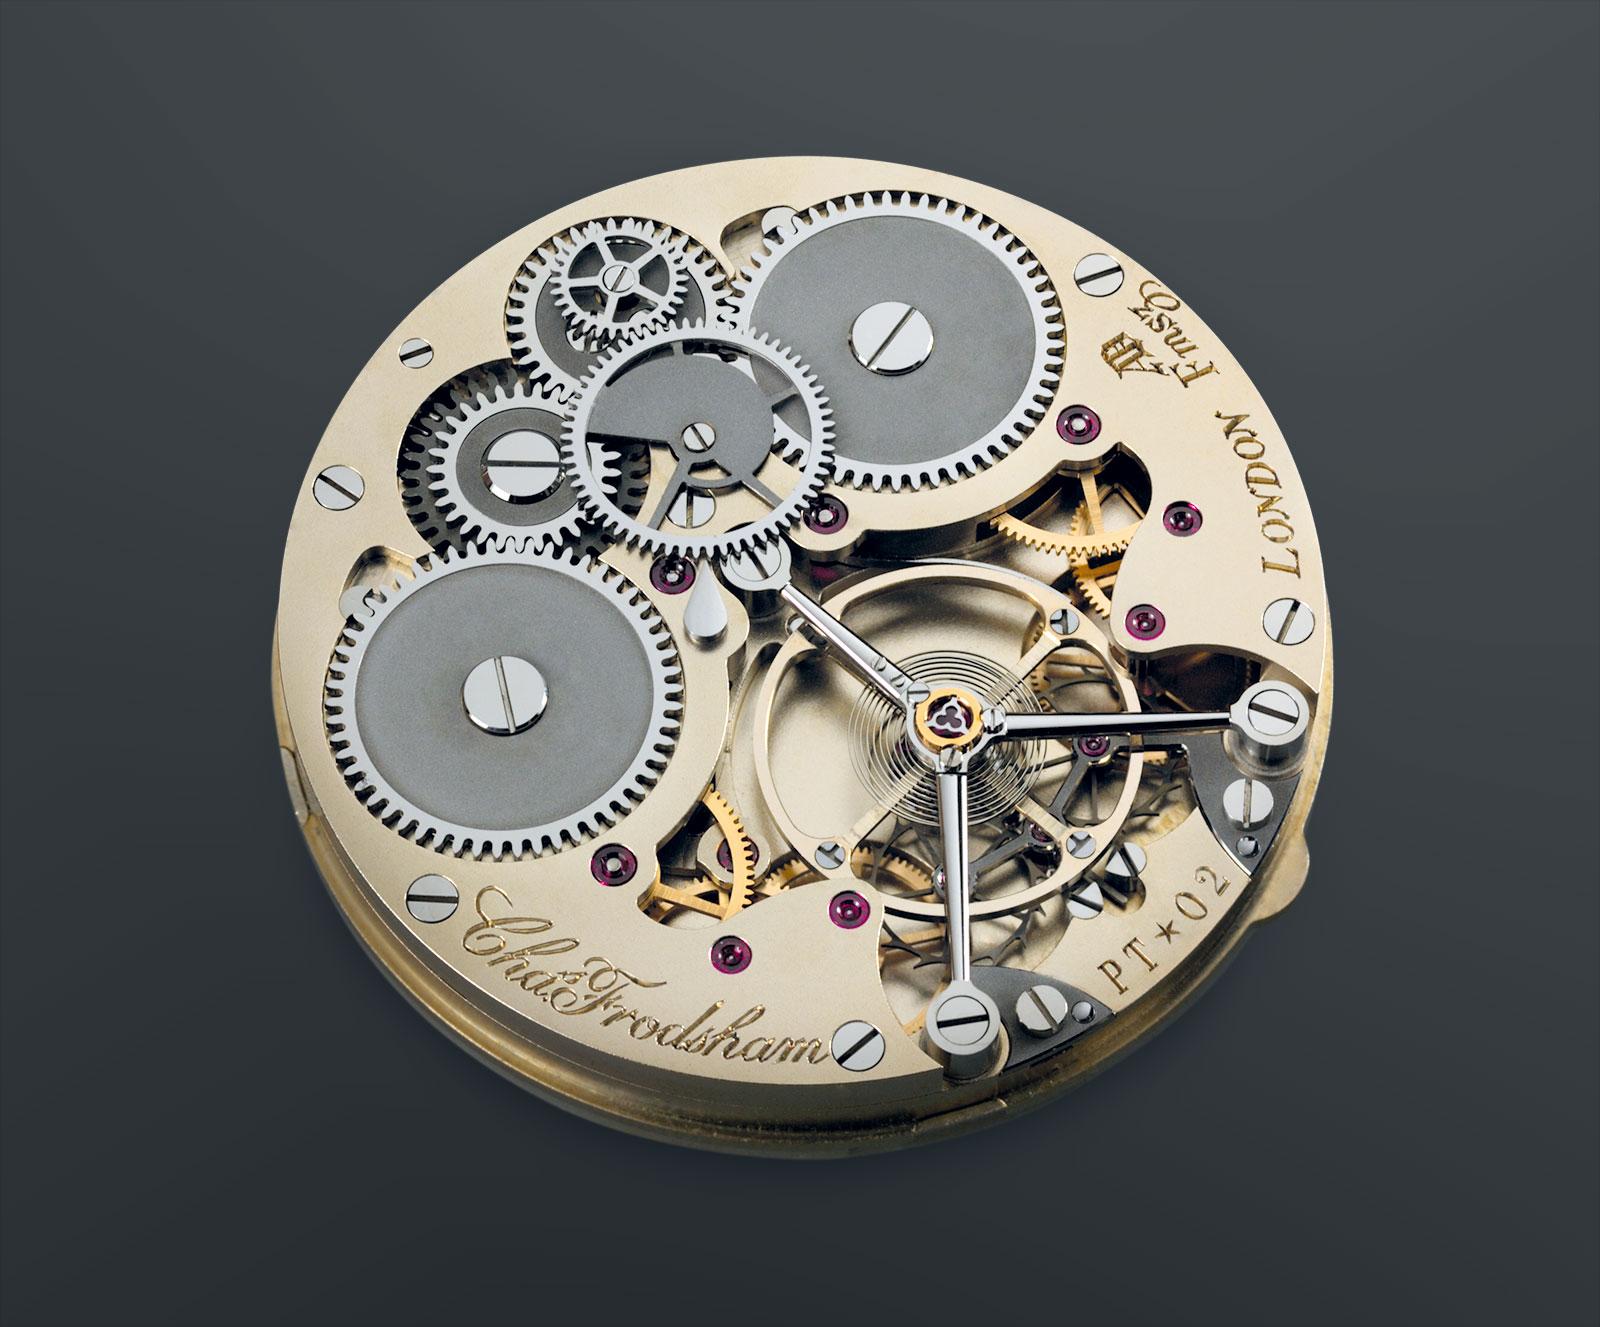 Charles Frodsham Wristwatch Double Impulse Chronometer 6